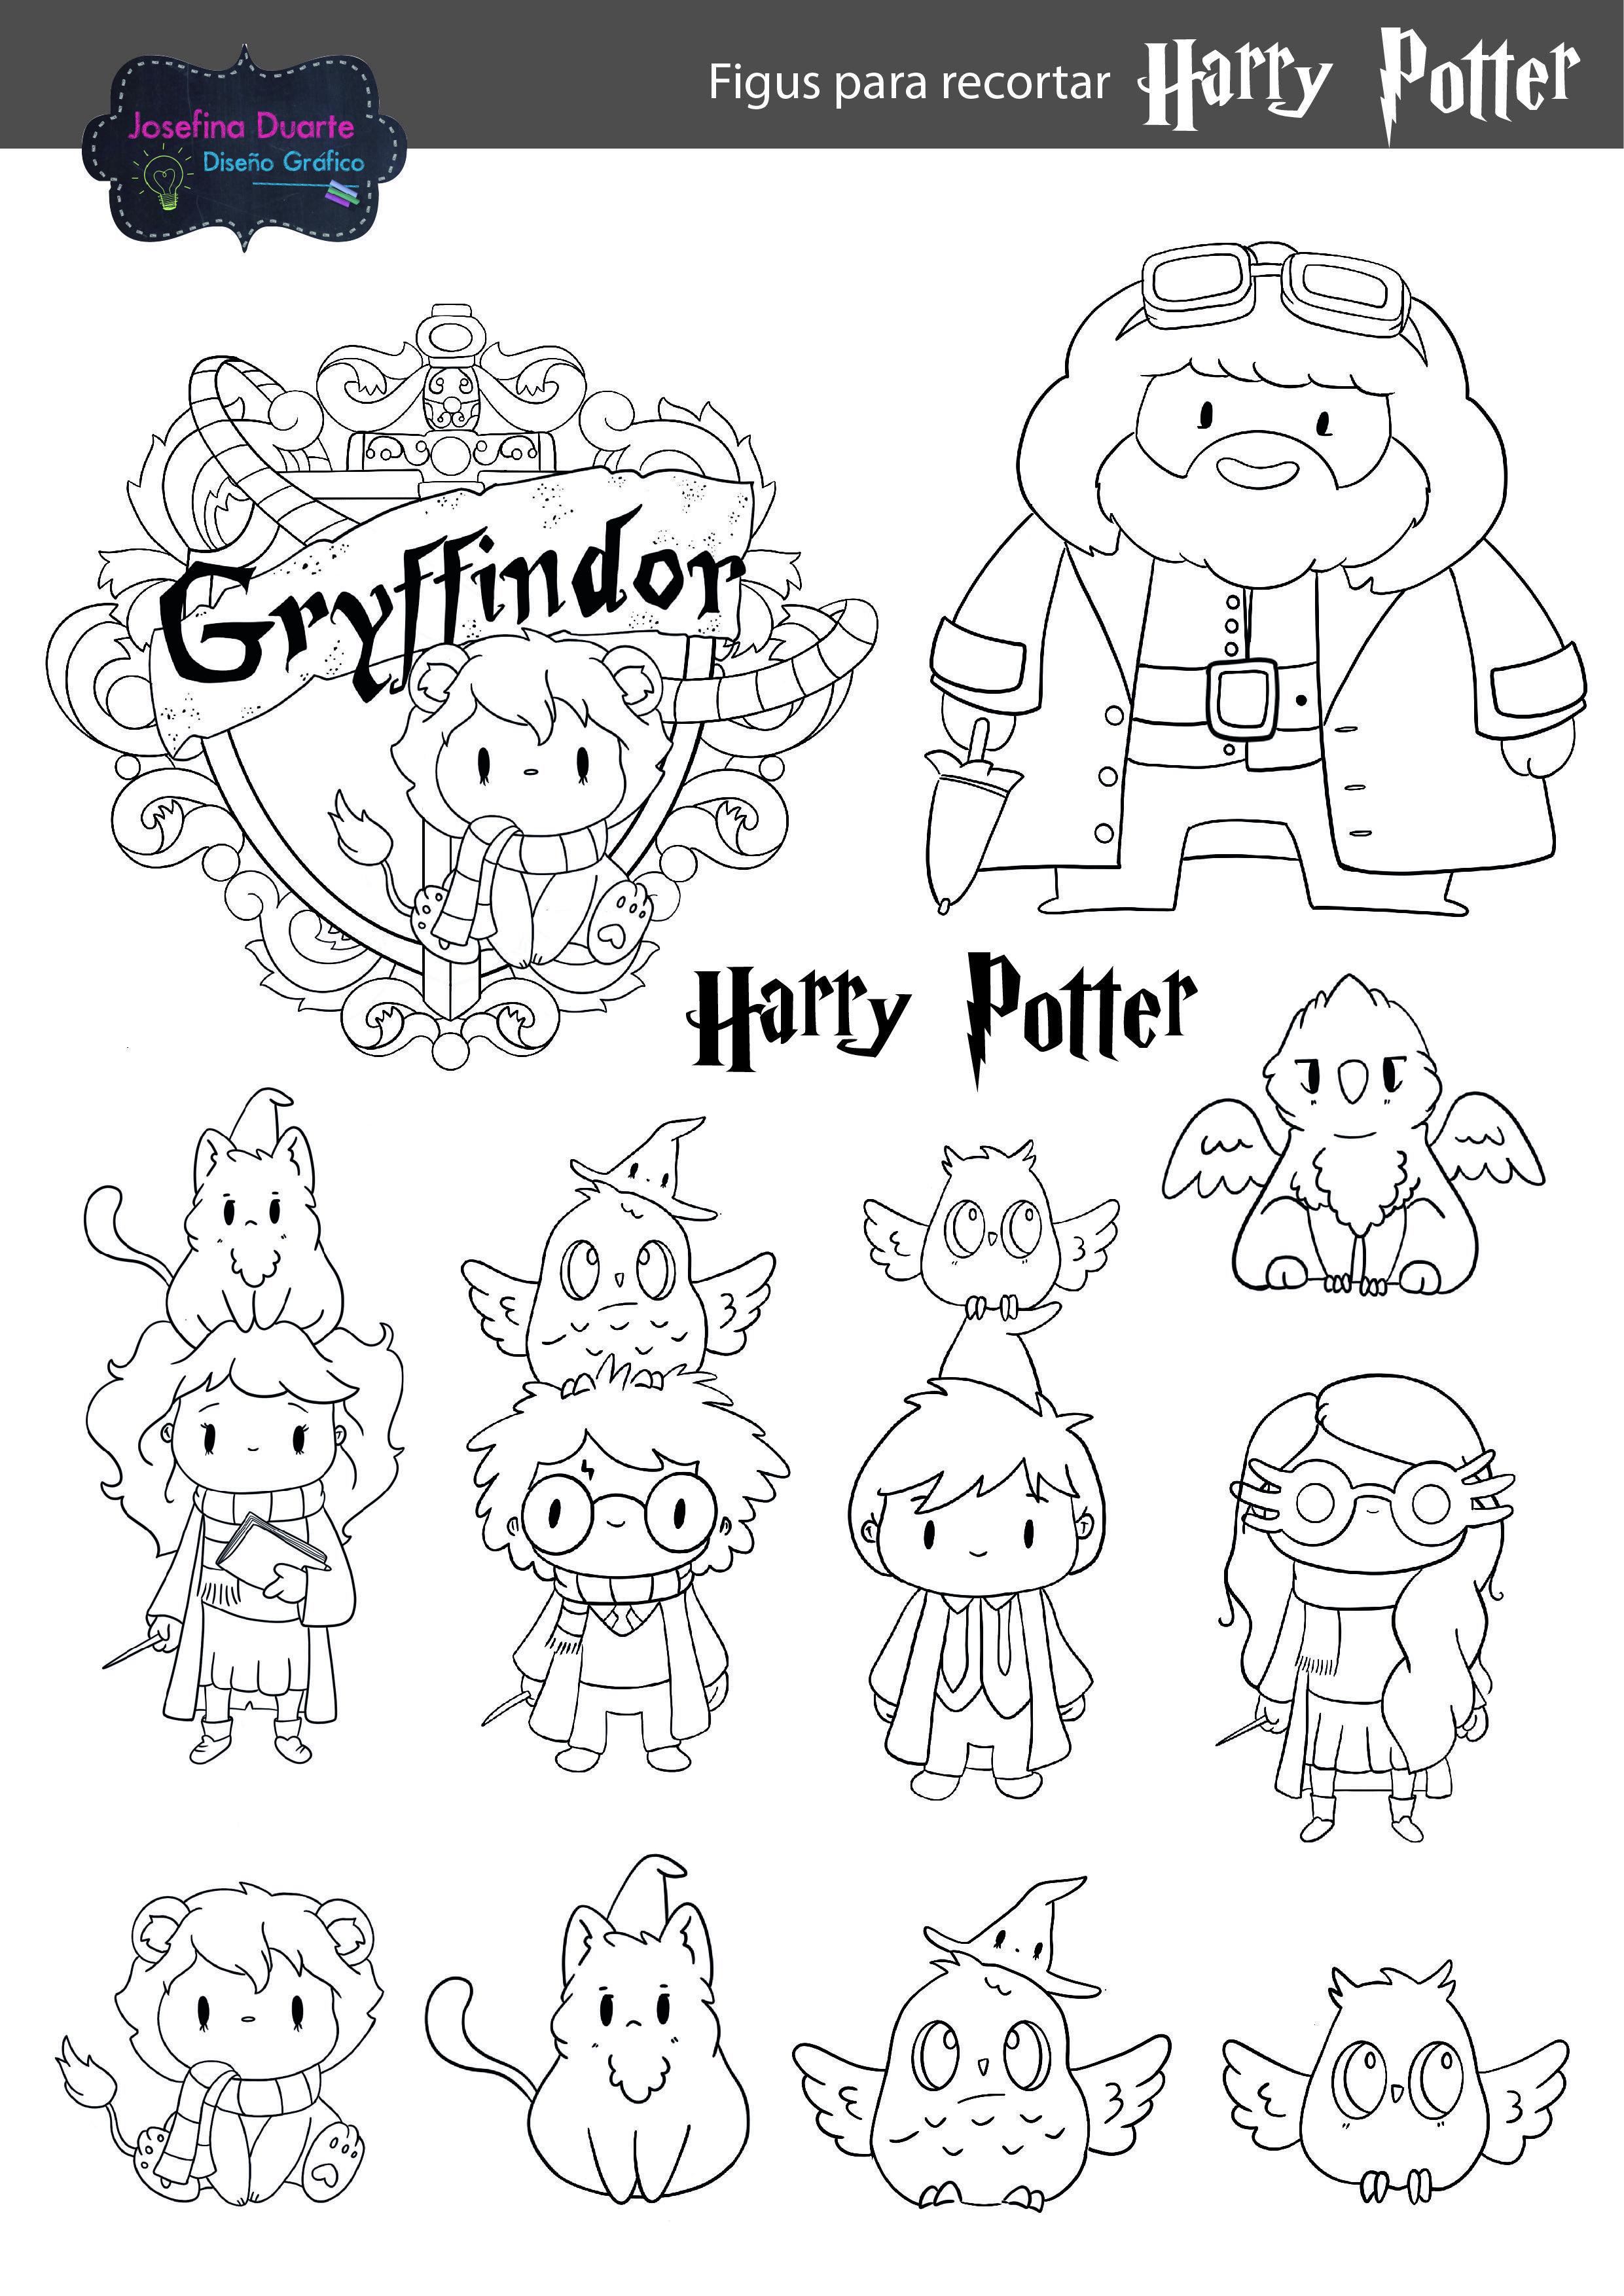 Digisellos Harry Potter Coloriage Harry Potter Stickers Harry Potter Dessin A Colorier